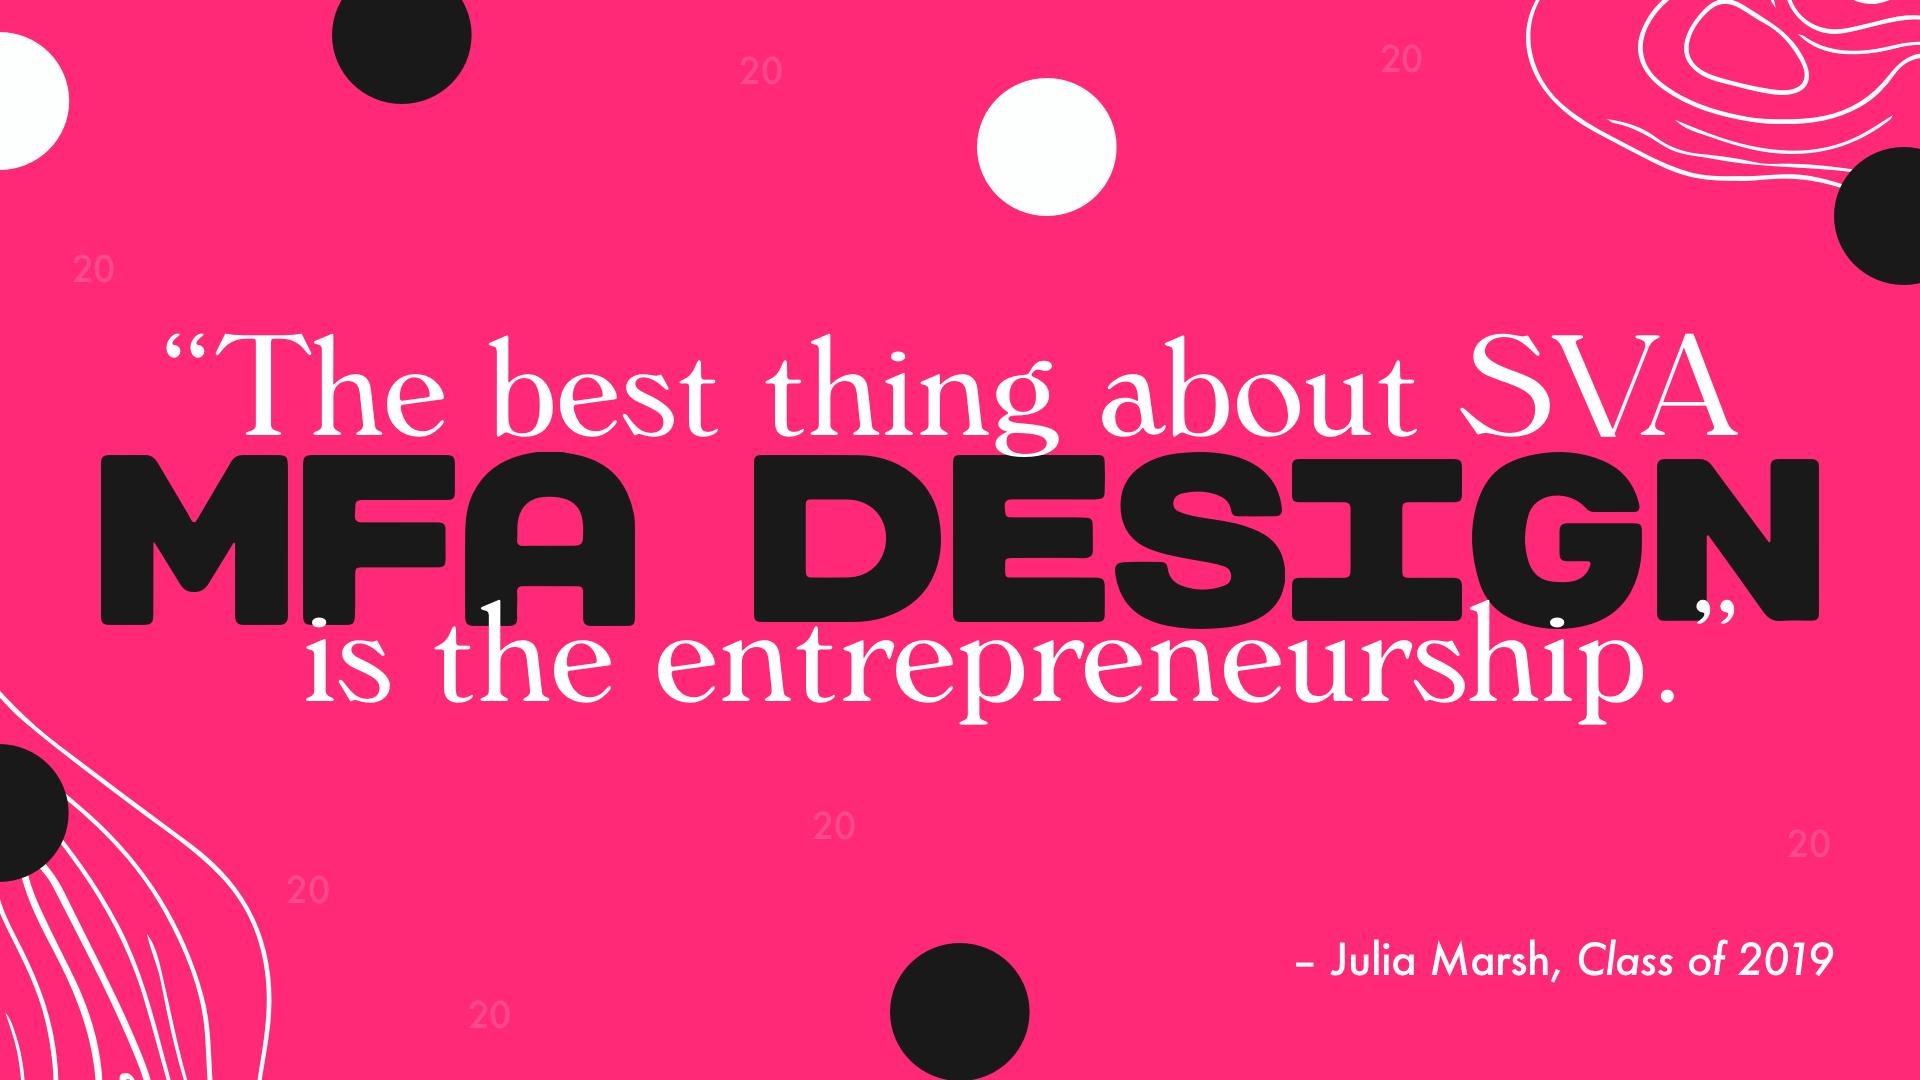 MFA Design entrepreneurship